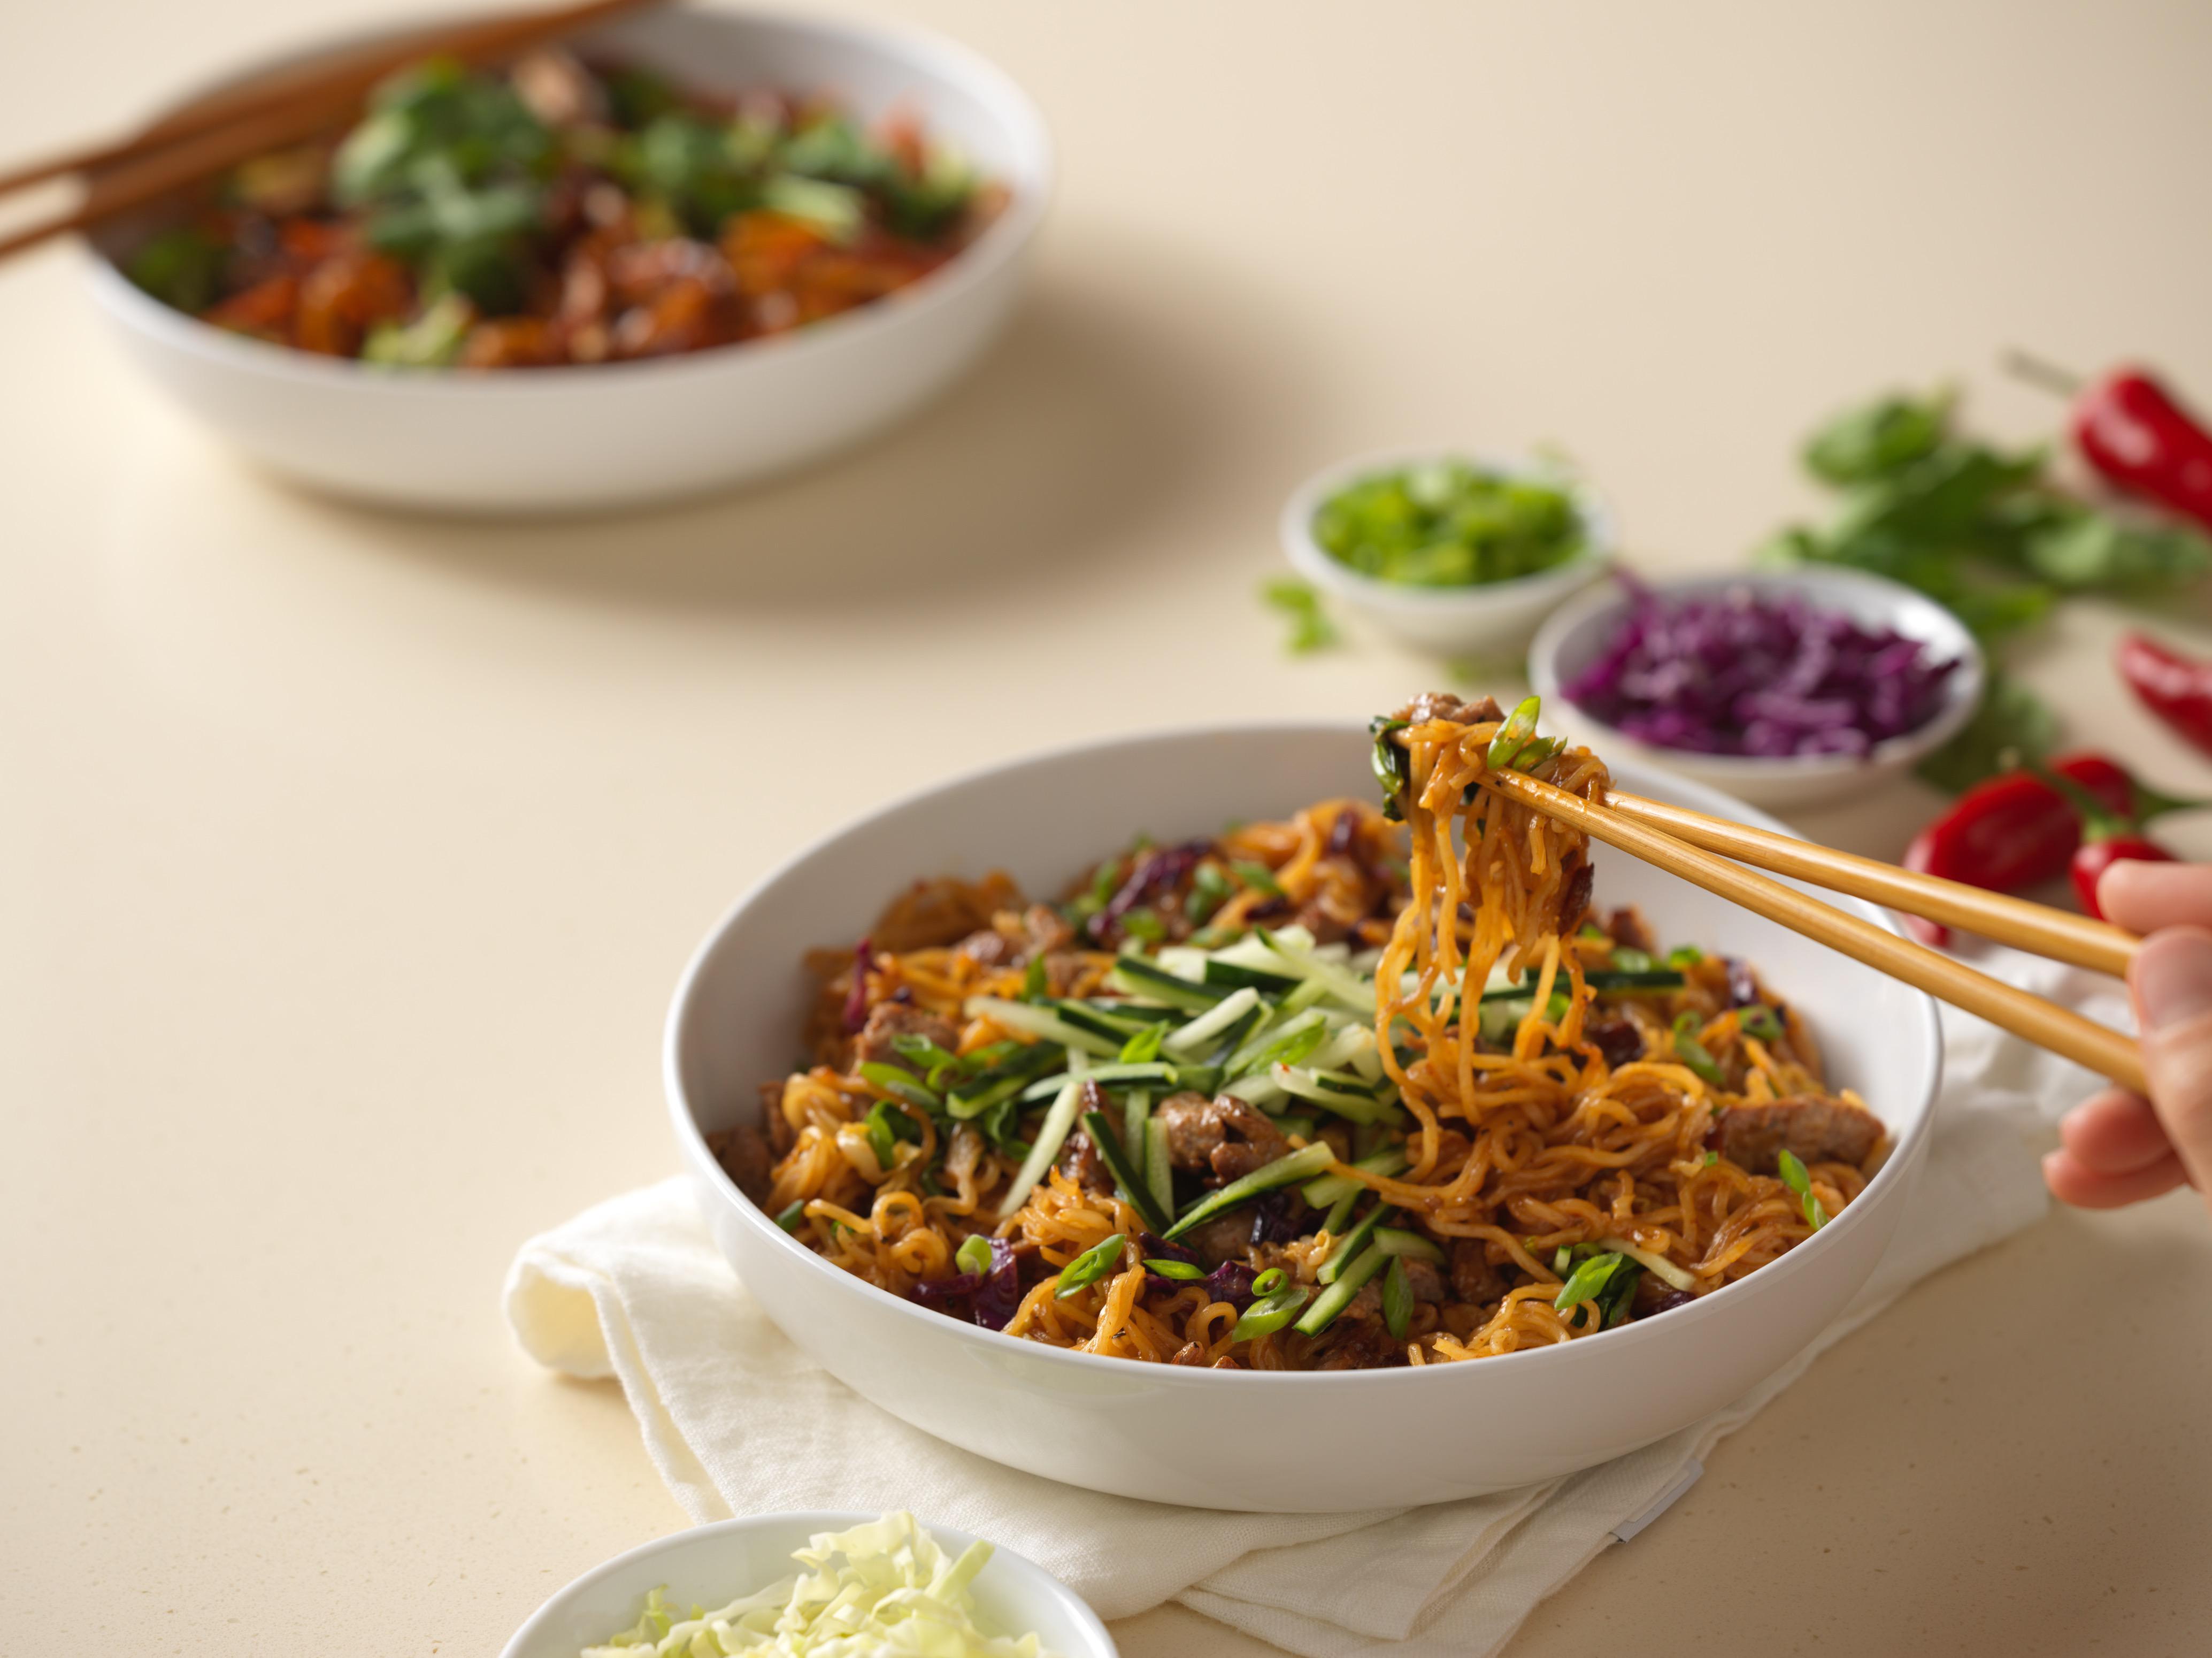 Noodles & Company image 2